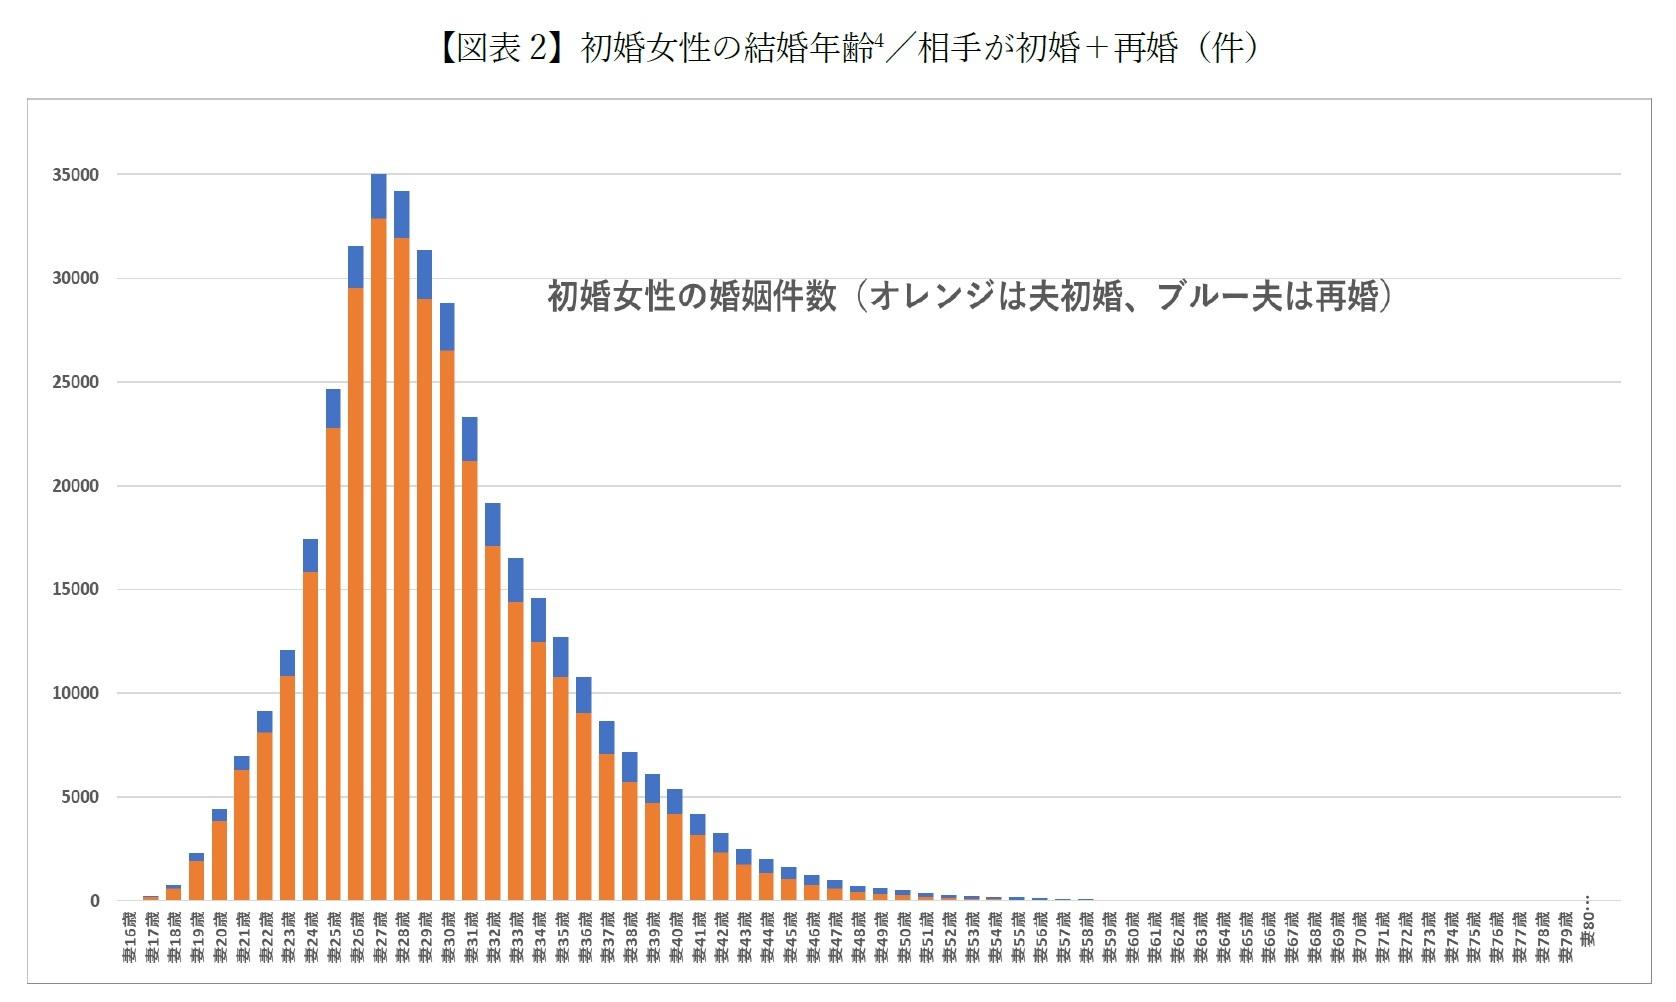 【図表2-1】初婚女性の結婚年齢 /相手が初婚+再婚(件)